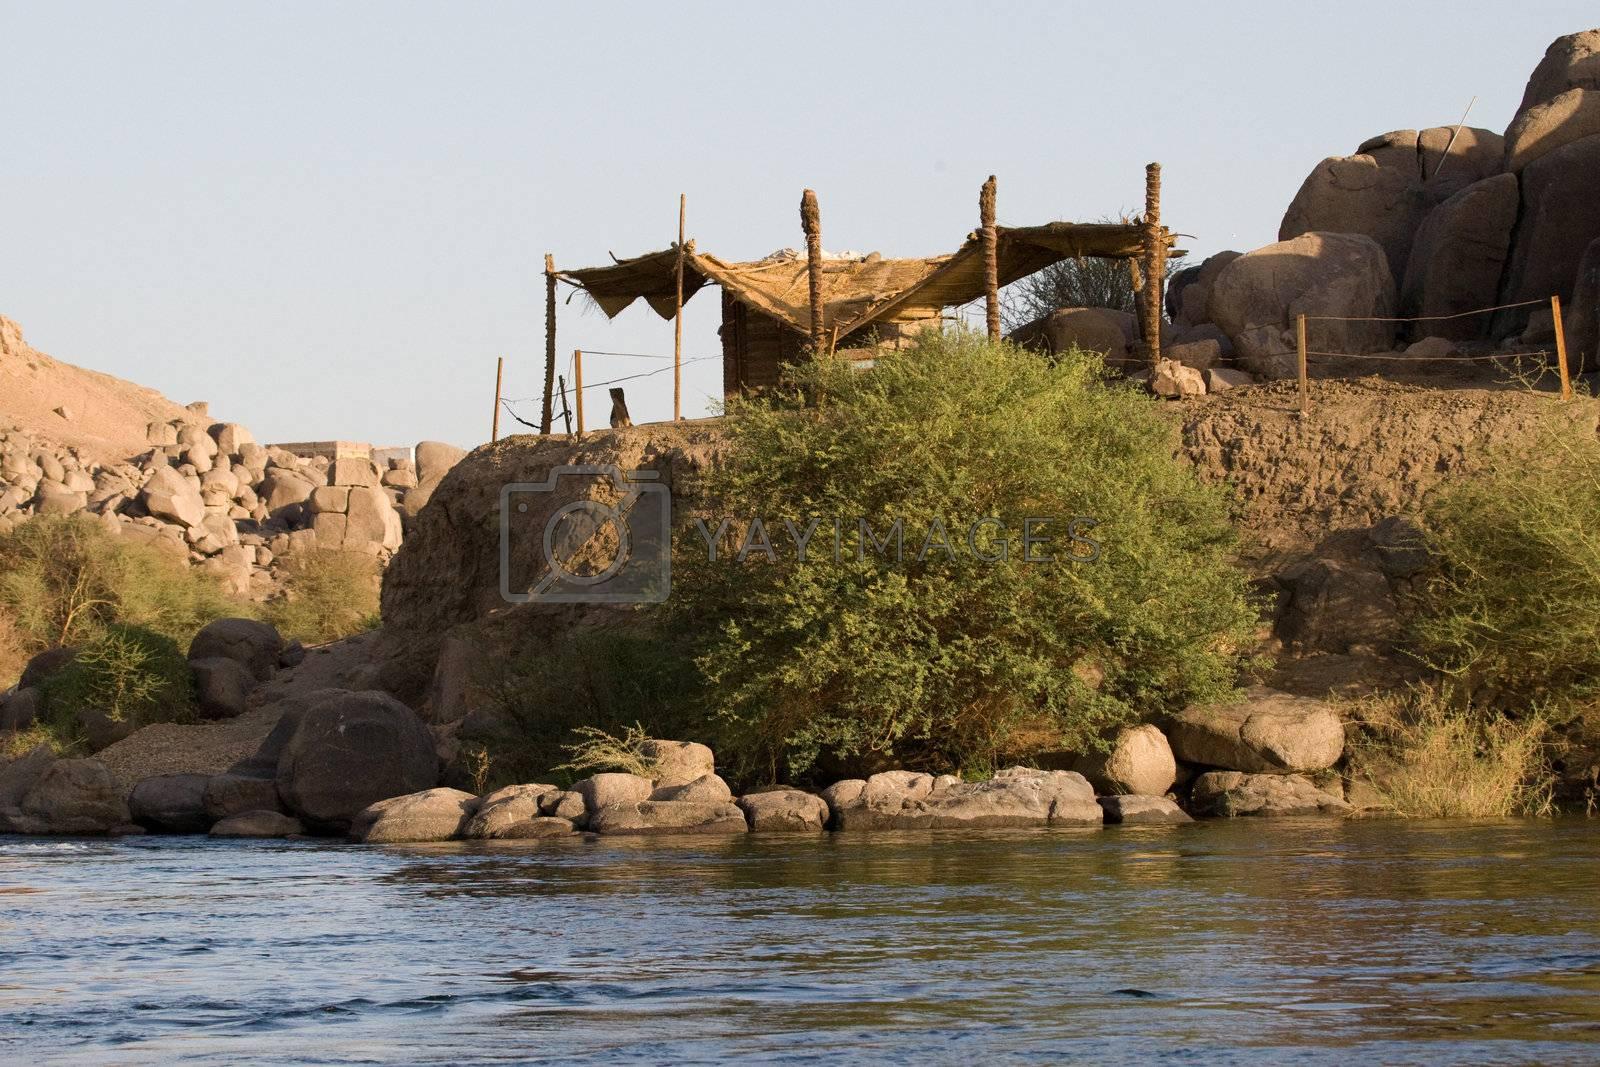 Royalty free image of Nile River near Aswan, Egypt by MihaiDancaescu